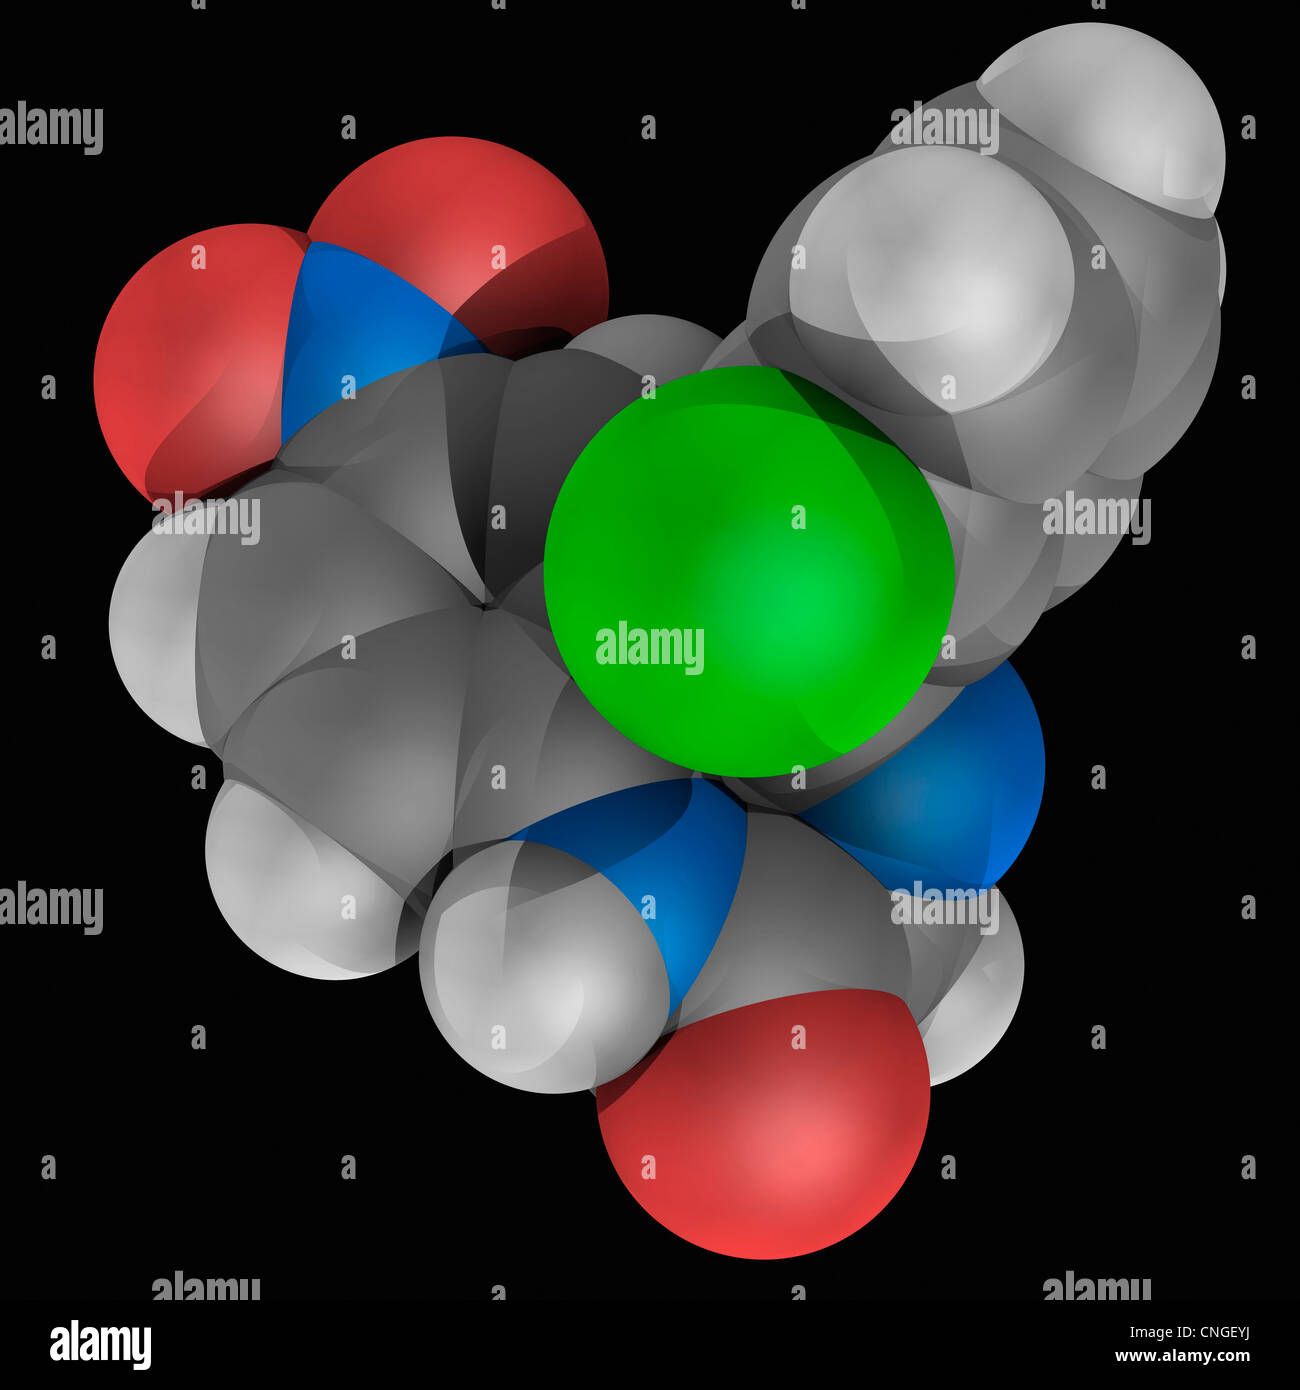 Clonazepam drug molecule Stock Photo